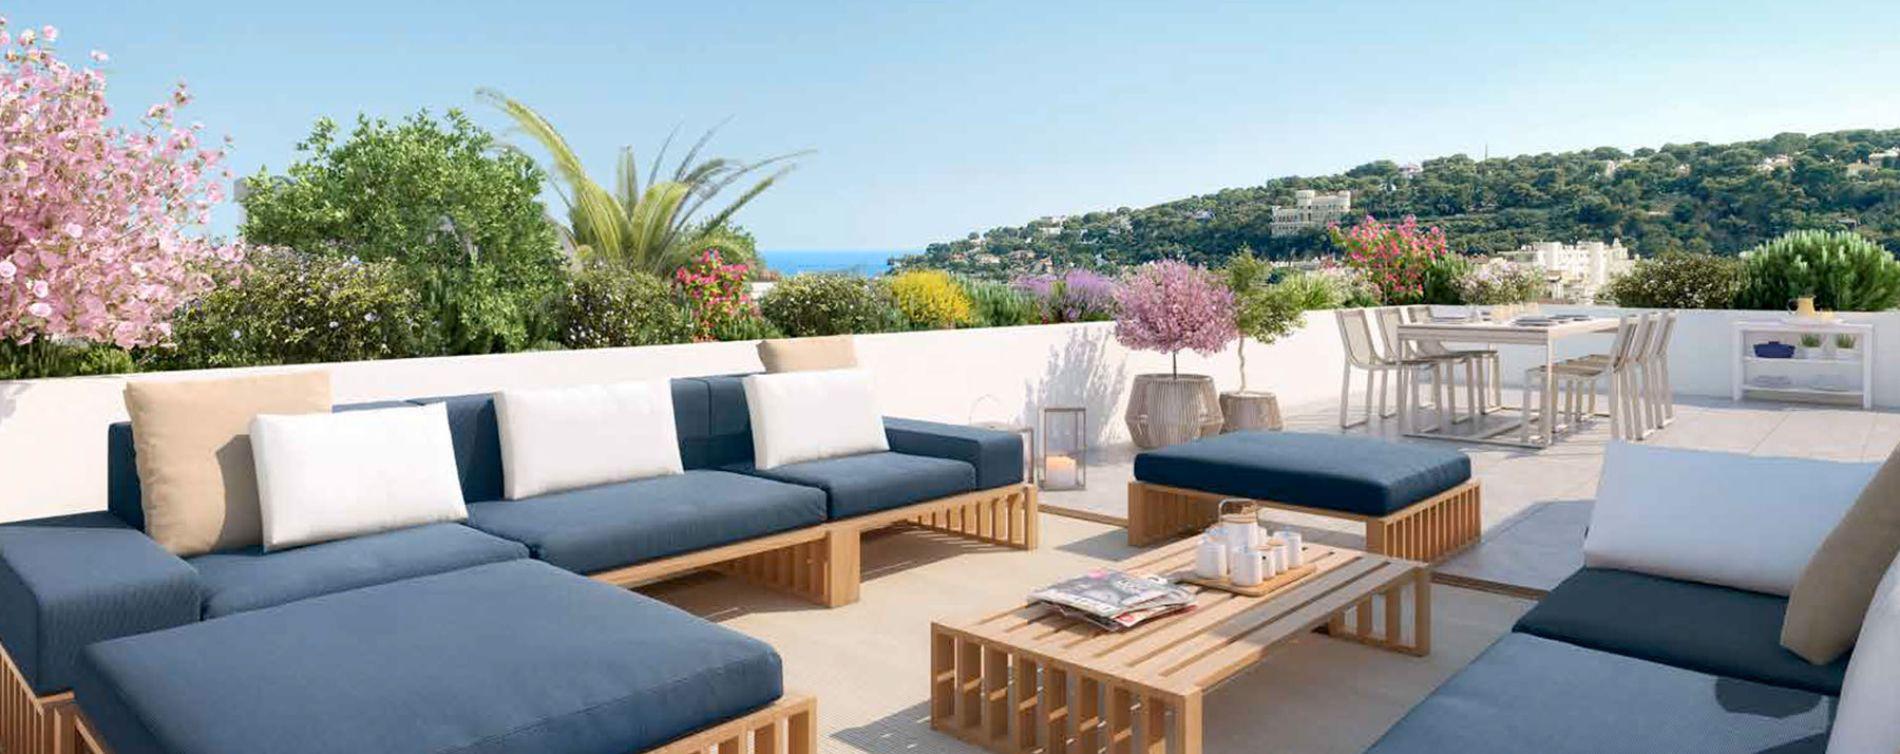 Résidence New Majestic à Roquebrune-Cap-Martin